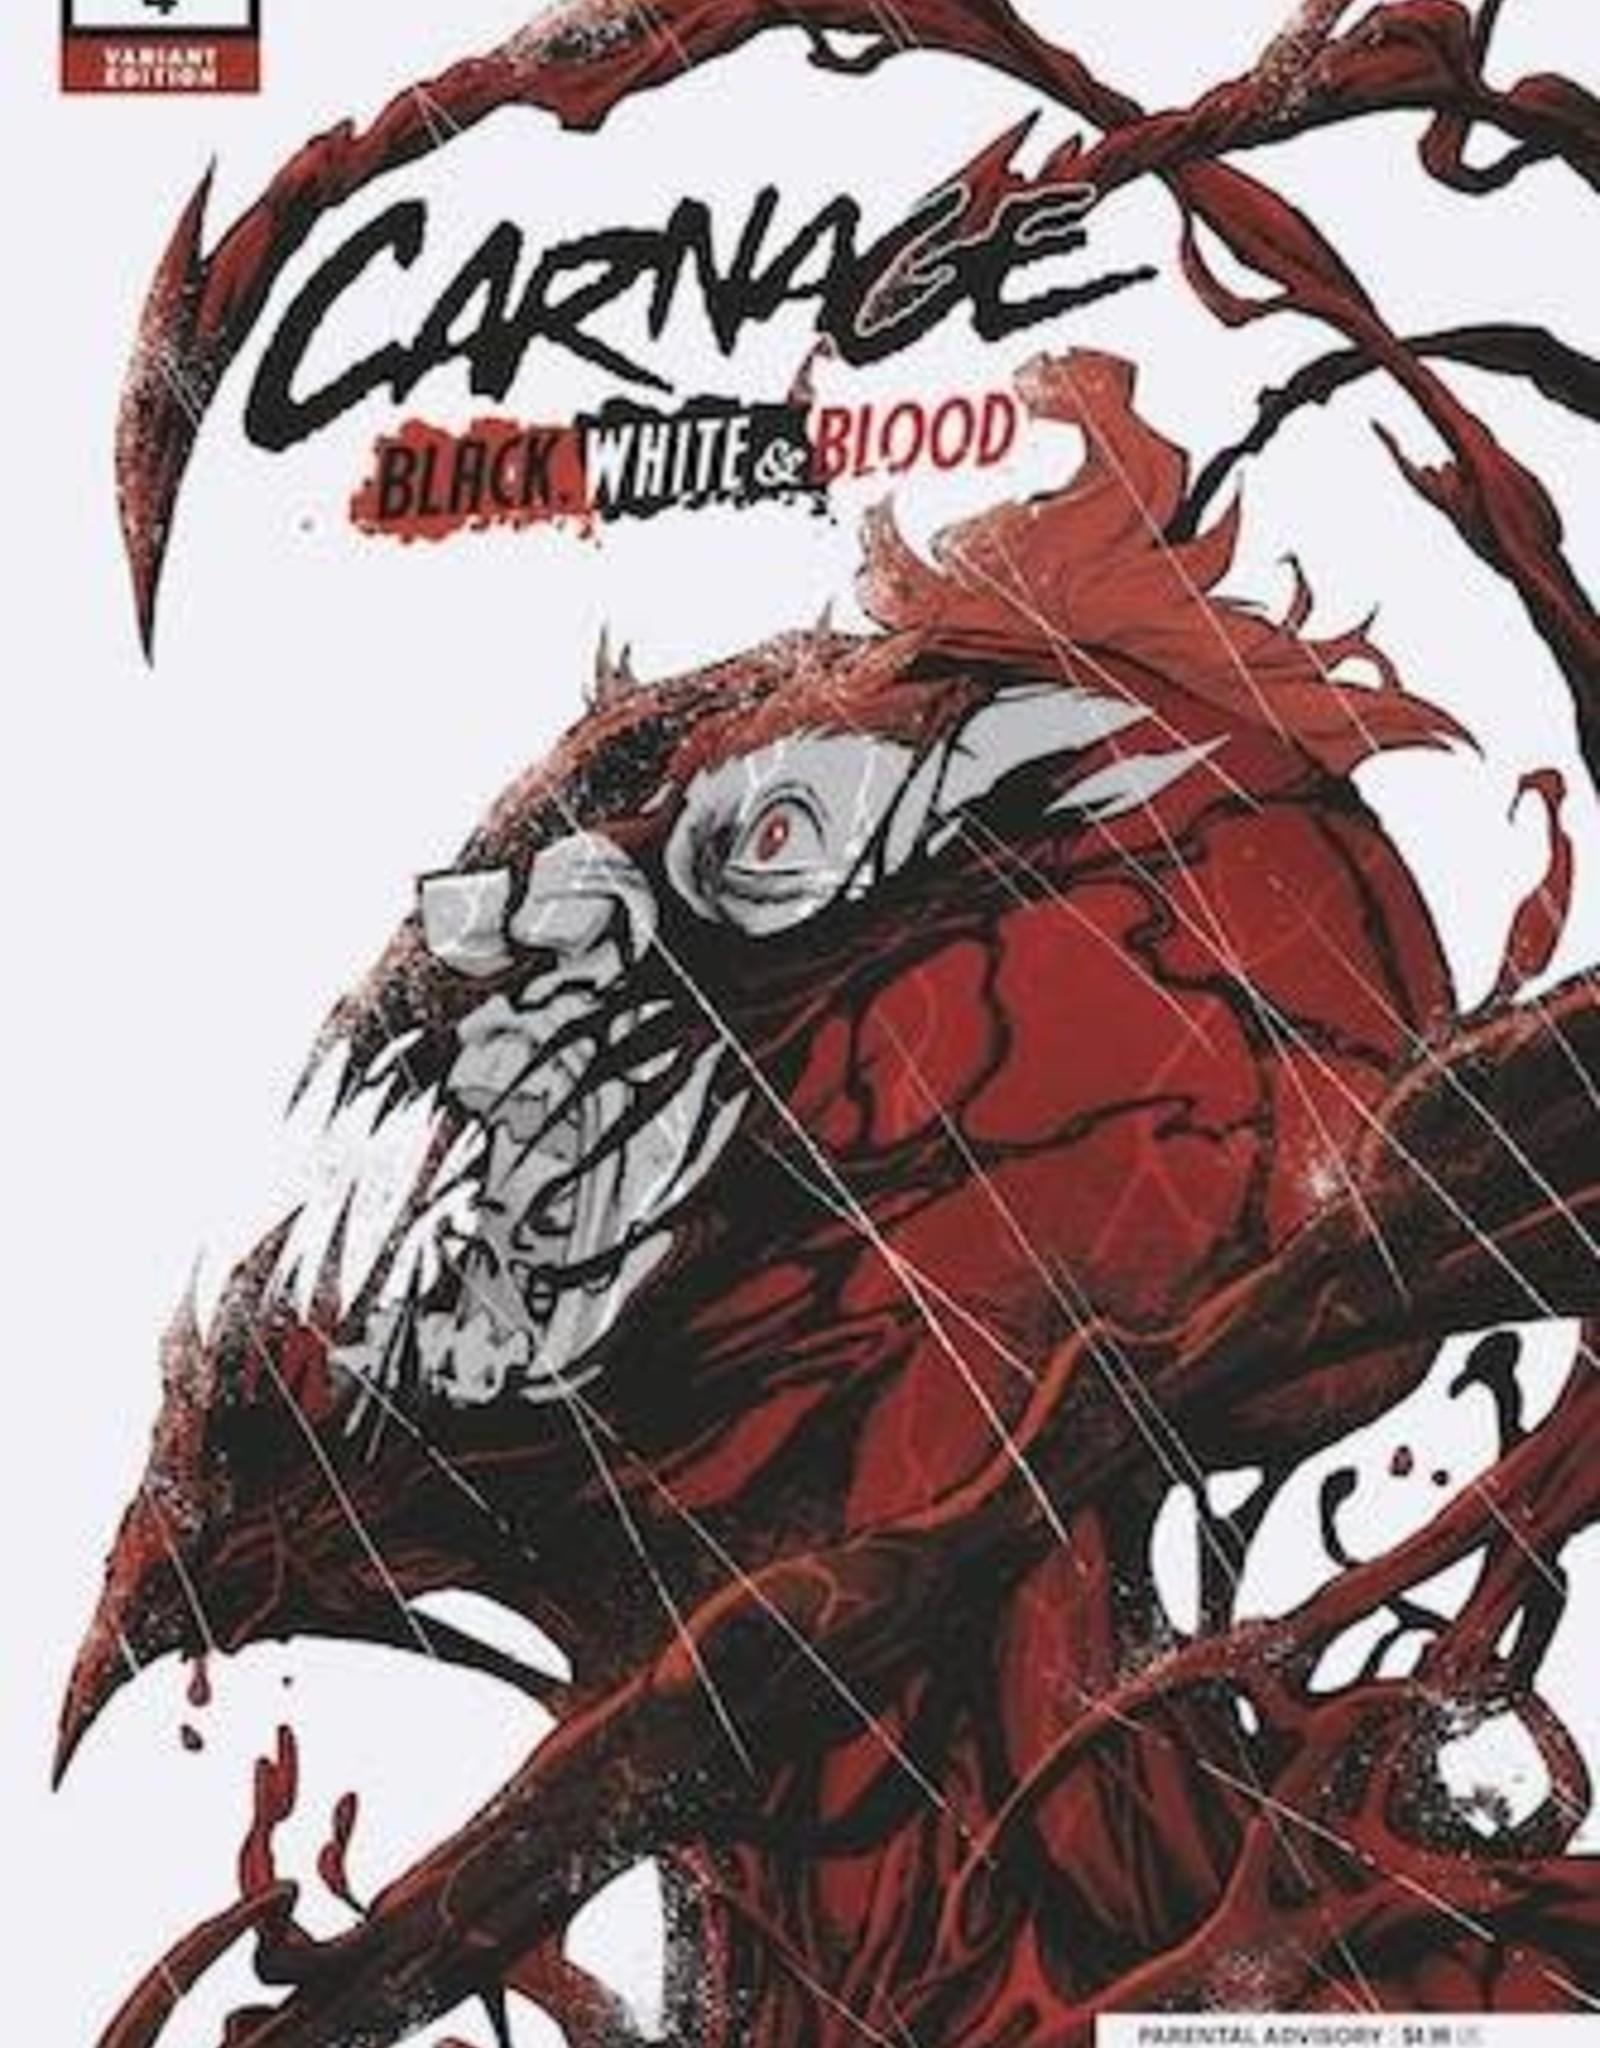 Marvel Comics Carnage Black White And Blood #4 Randolph Var